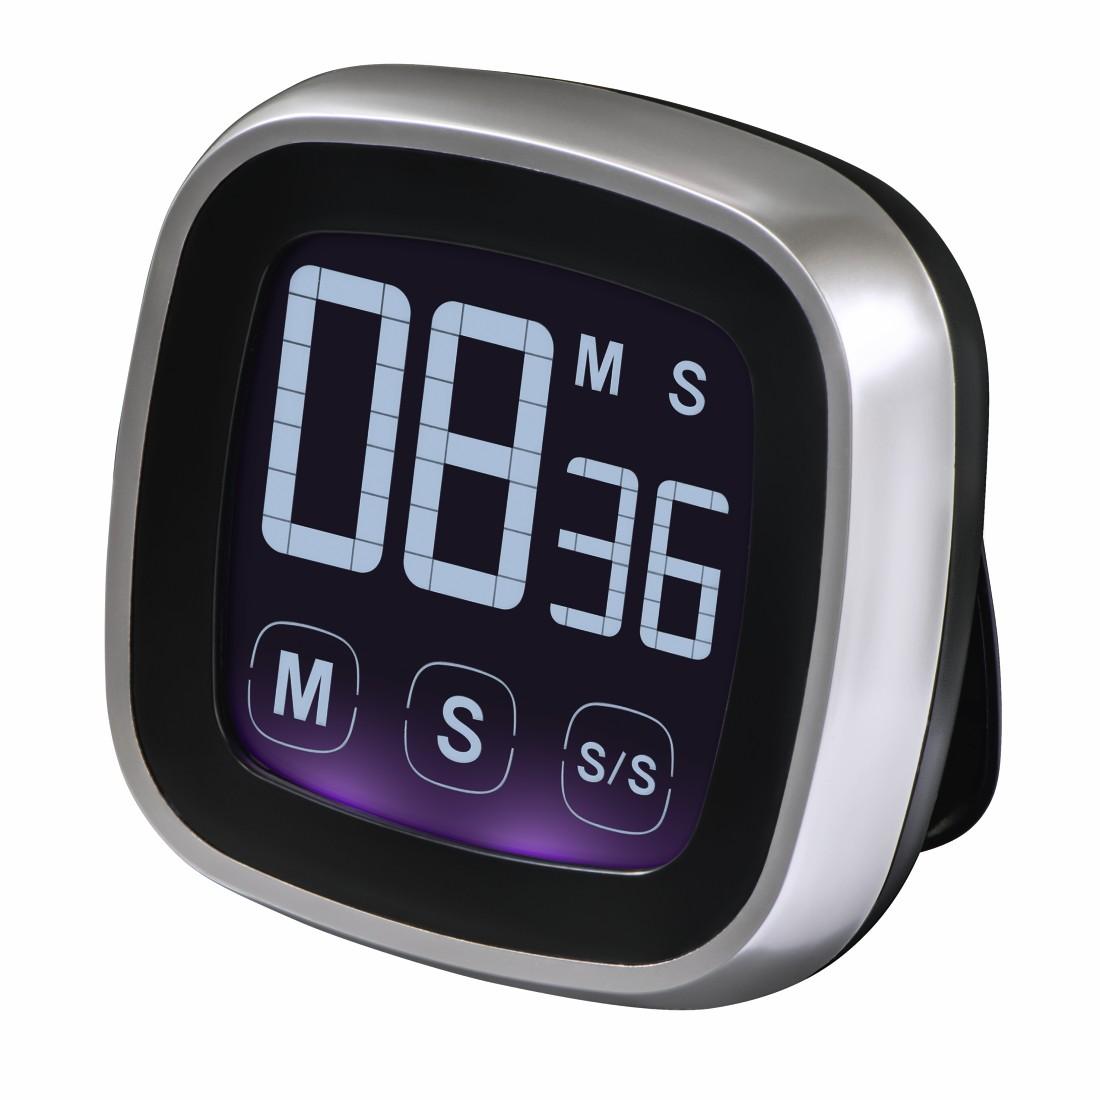 00095321 Xavax Touch Kitchen Timer Digital Silver Black Xavax Eu